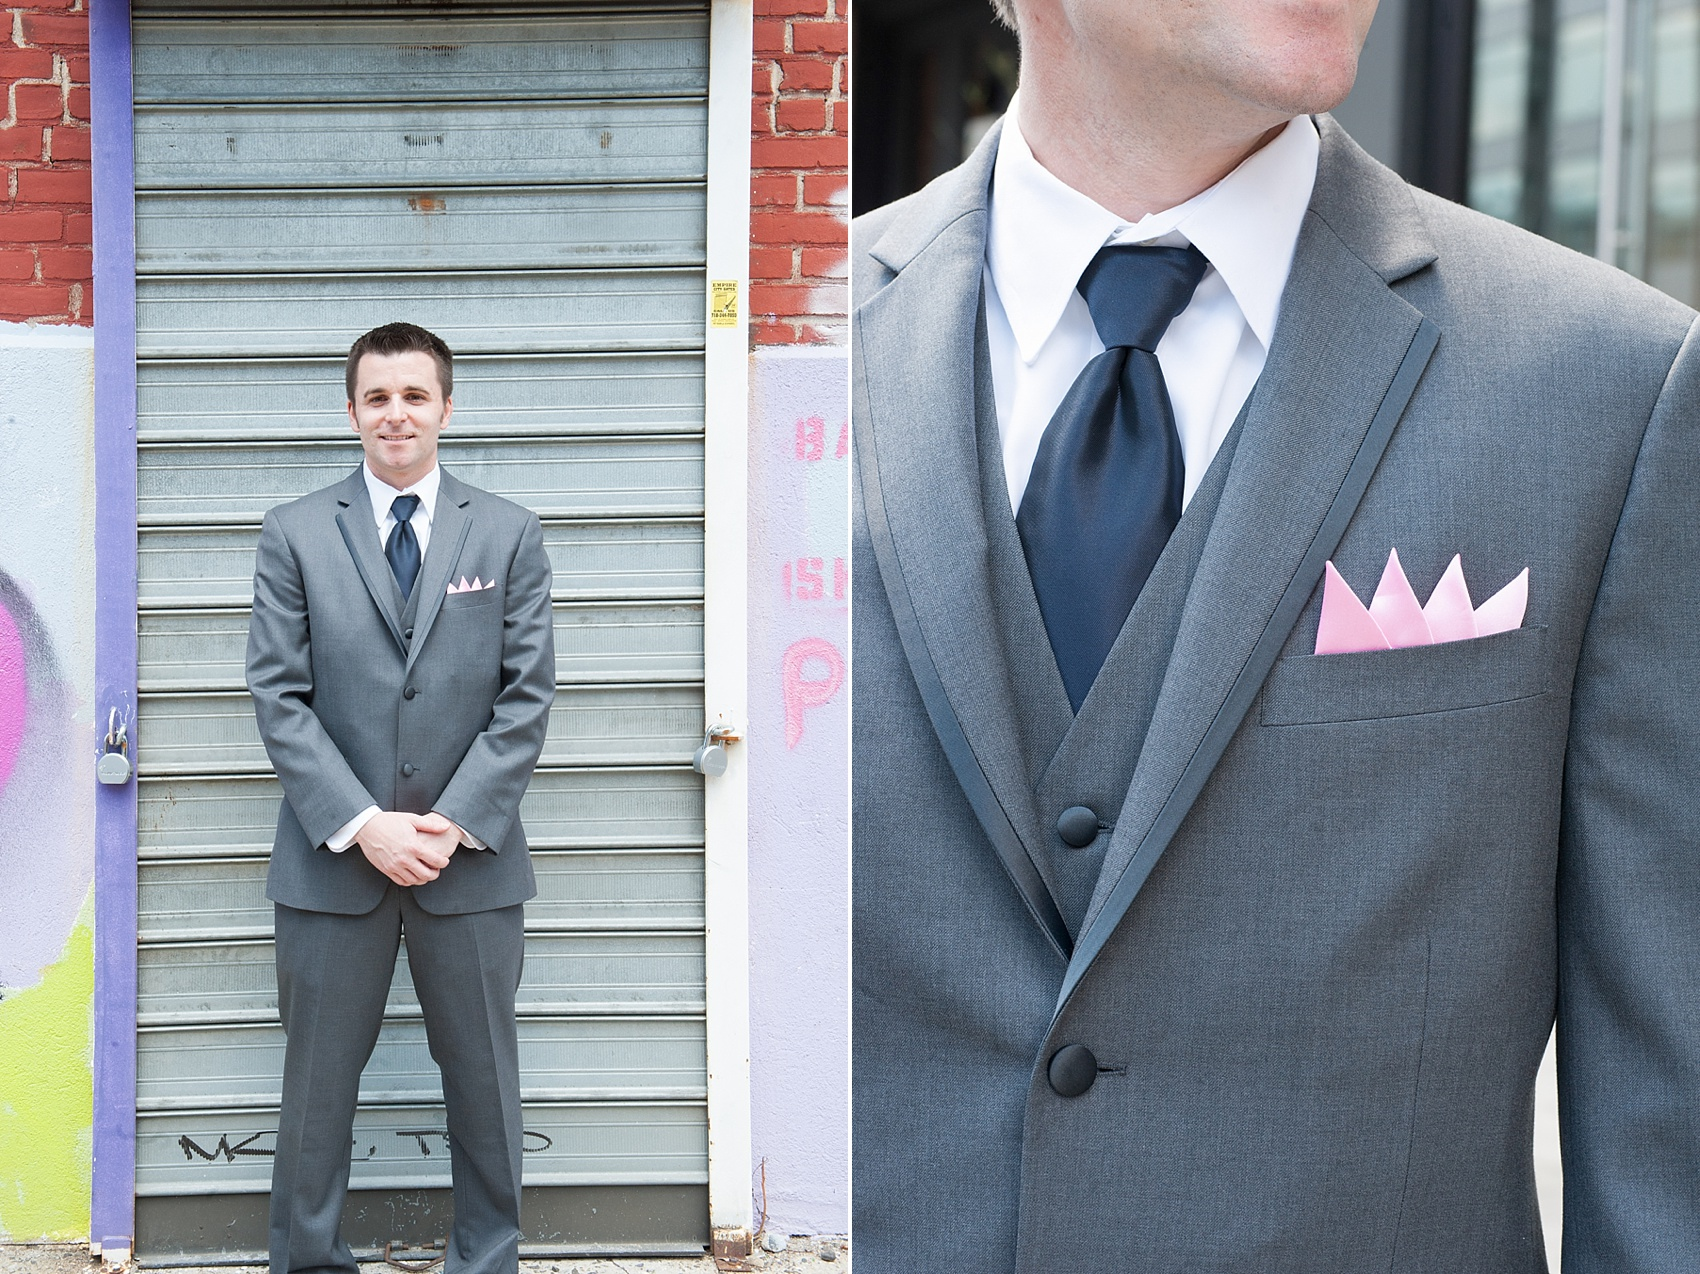 Colorful Summer Wedding Tuxedo Inspiration - All Wedding Dresses ...